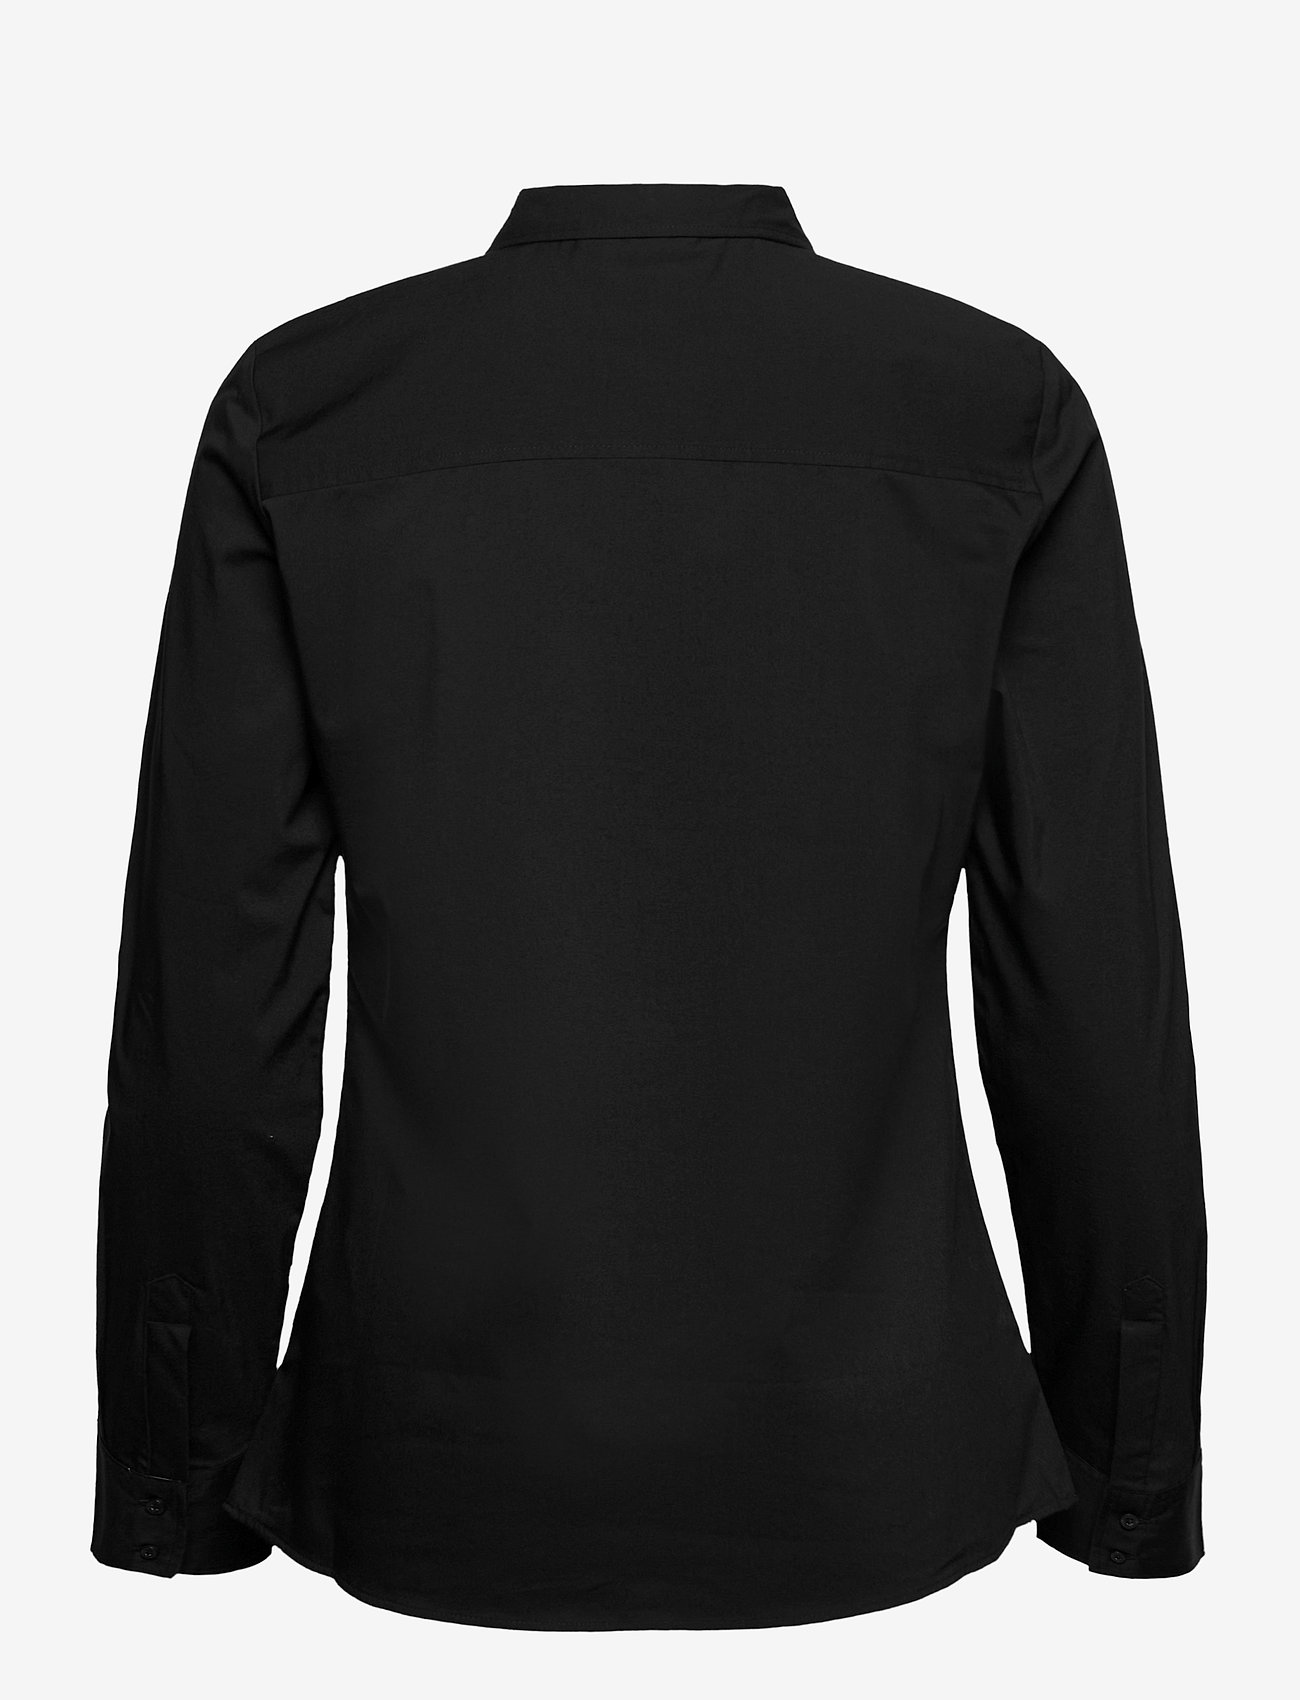 Fransa - Zashirt 1 Shirt - pitkähihaiset paidat - black - 1